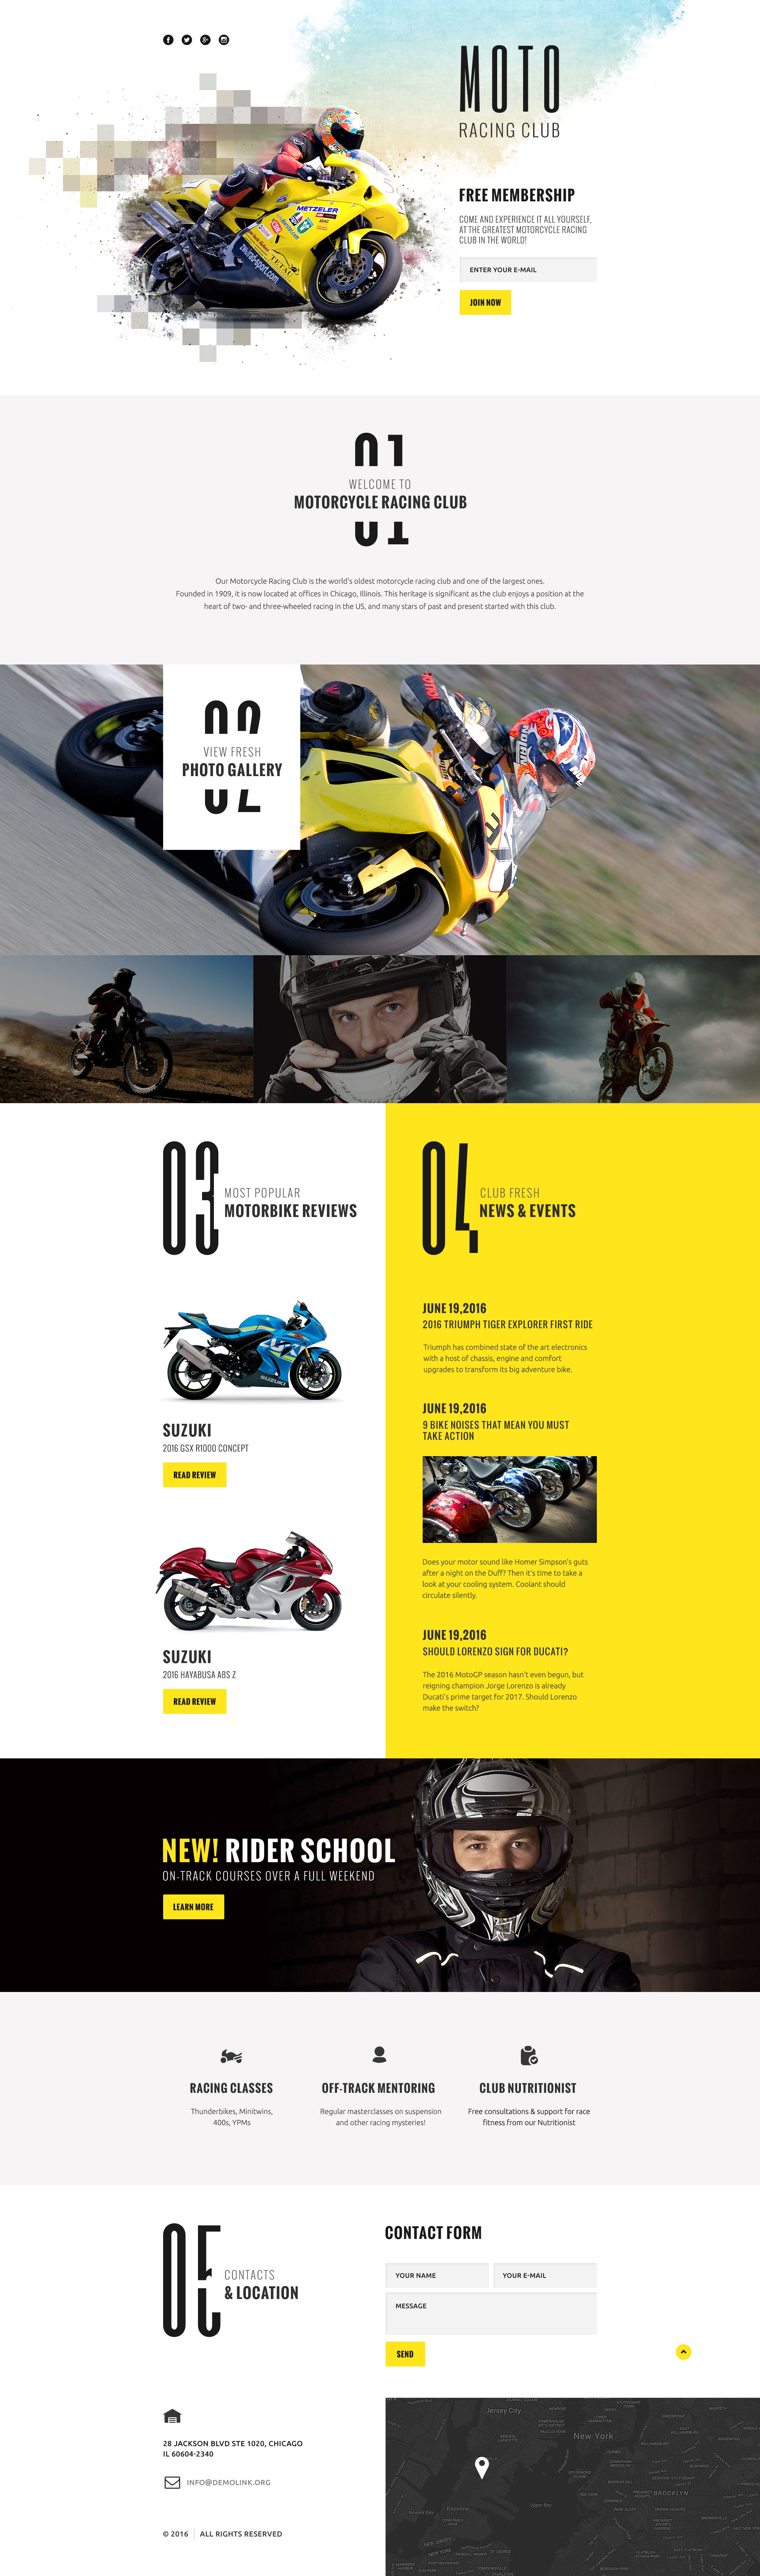 Responsywny szablon Landing Page #58525 na temat: sporty motorowe